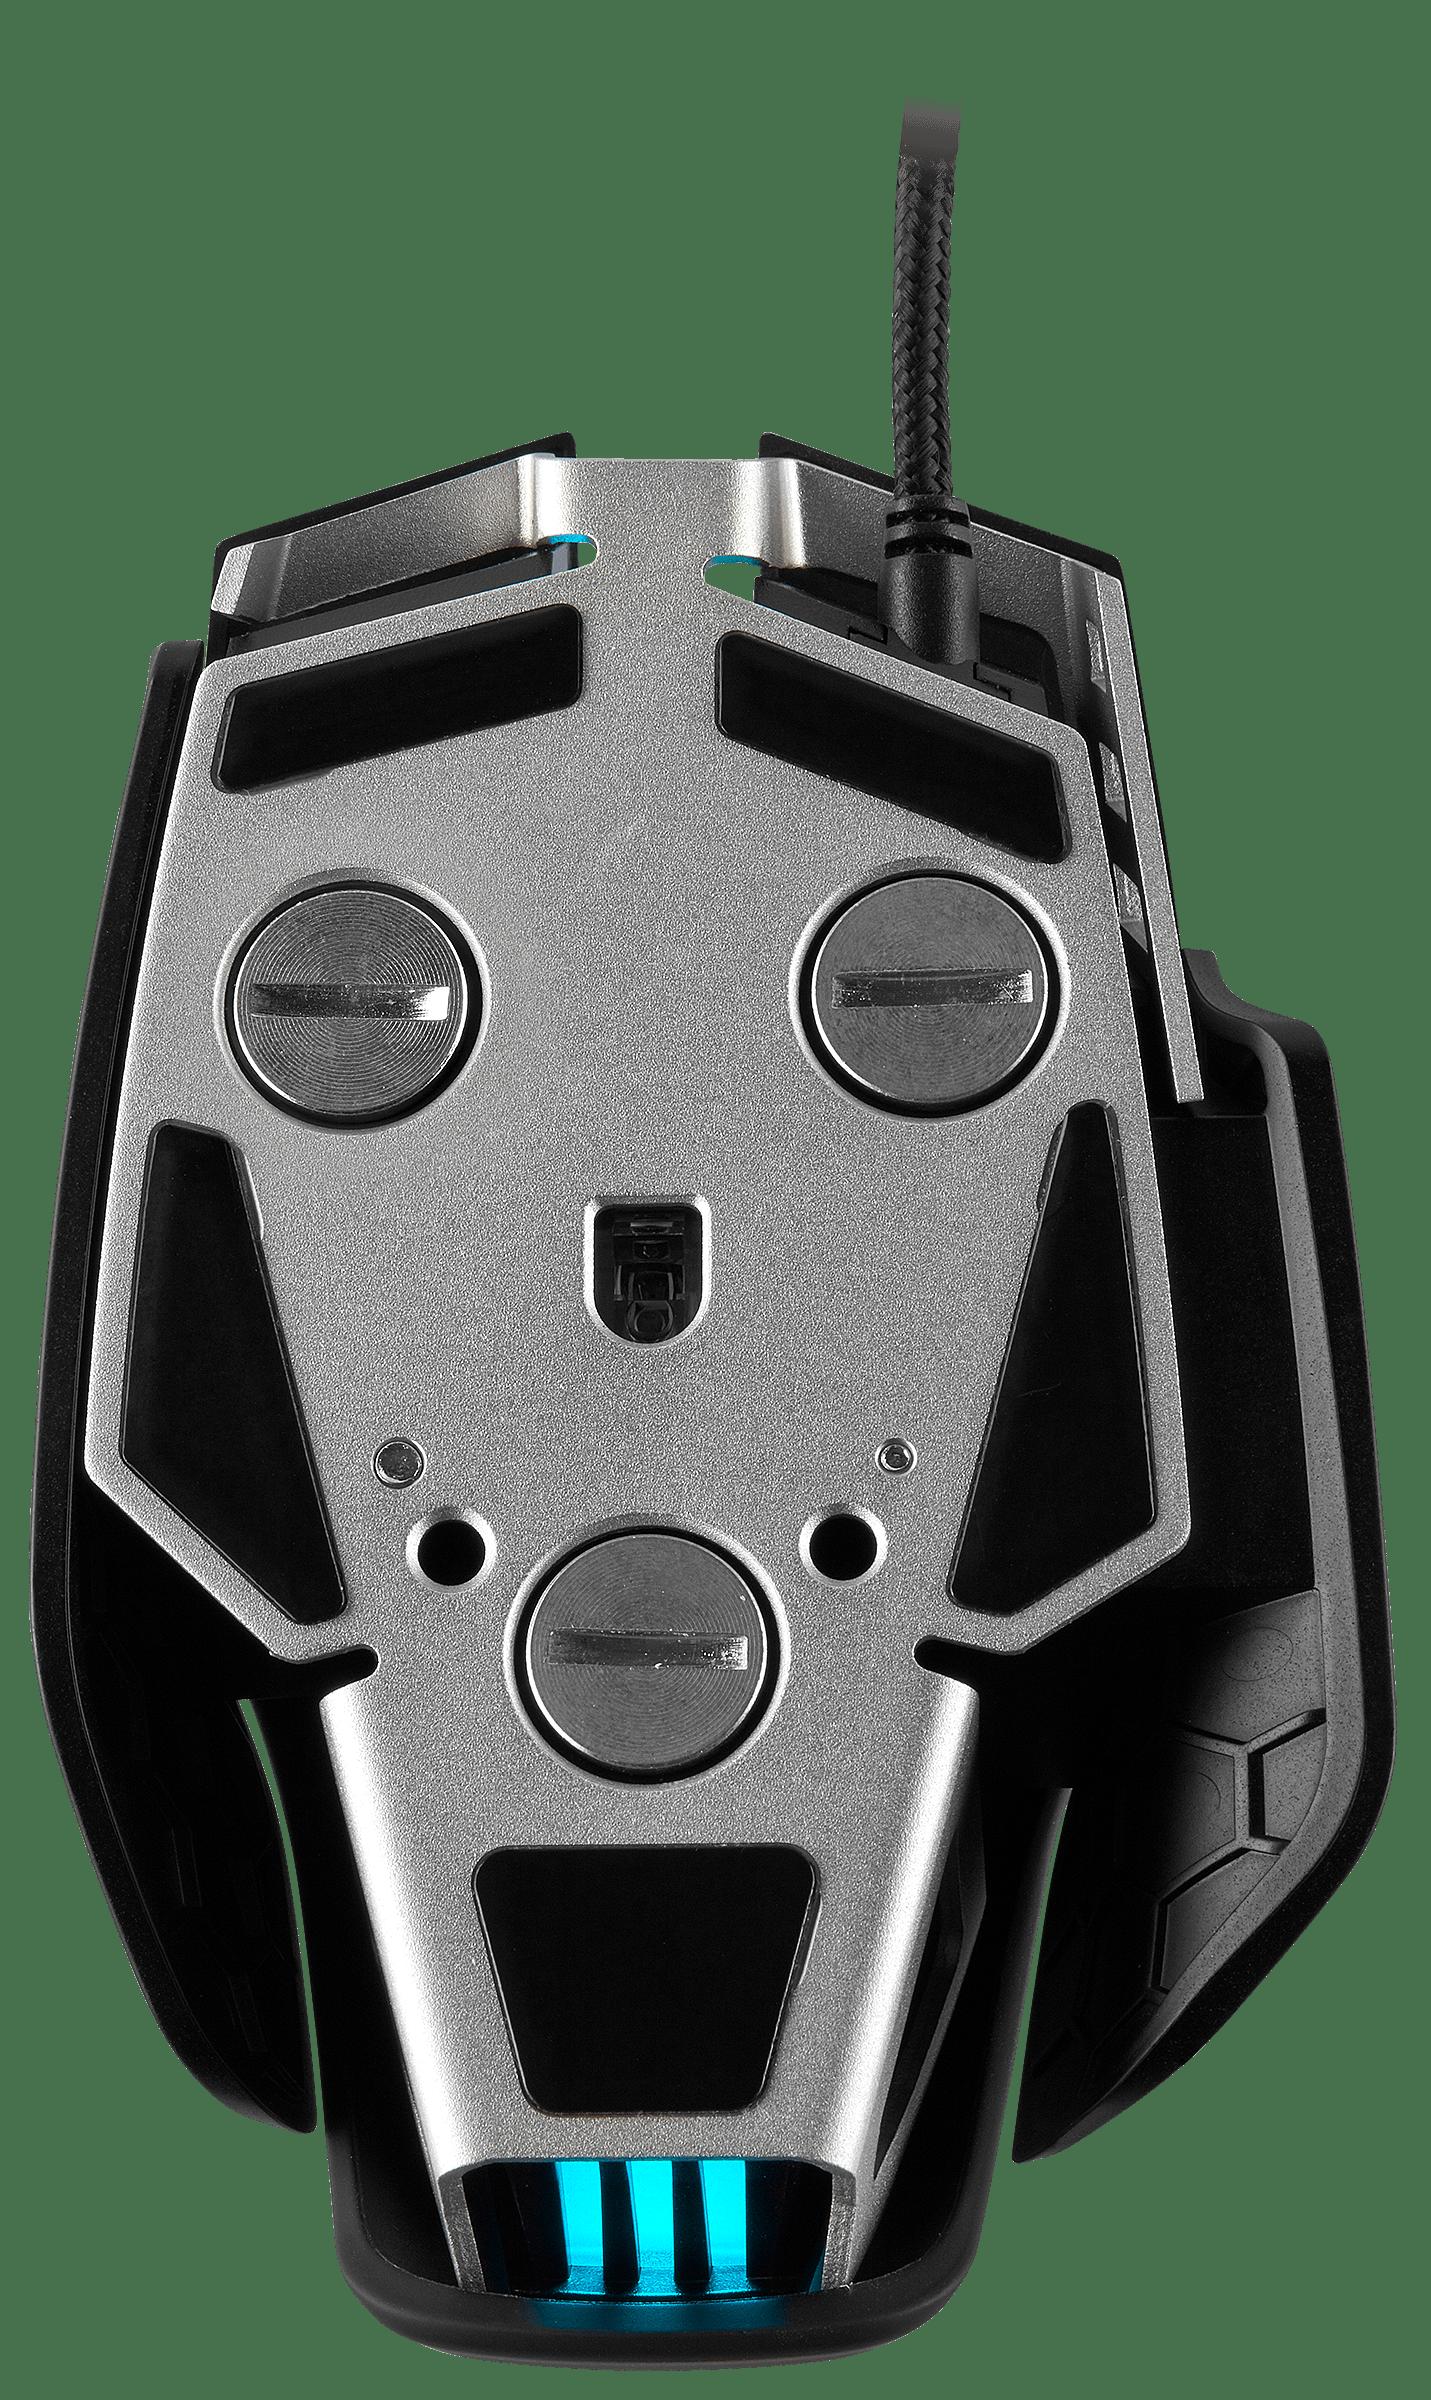 e4c6da19411 Buy Corsair M65 Elite RGB Optical Mouse - Black | GAME